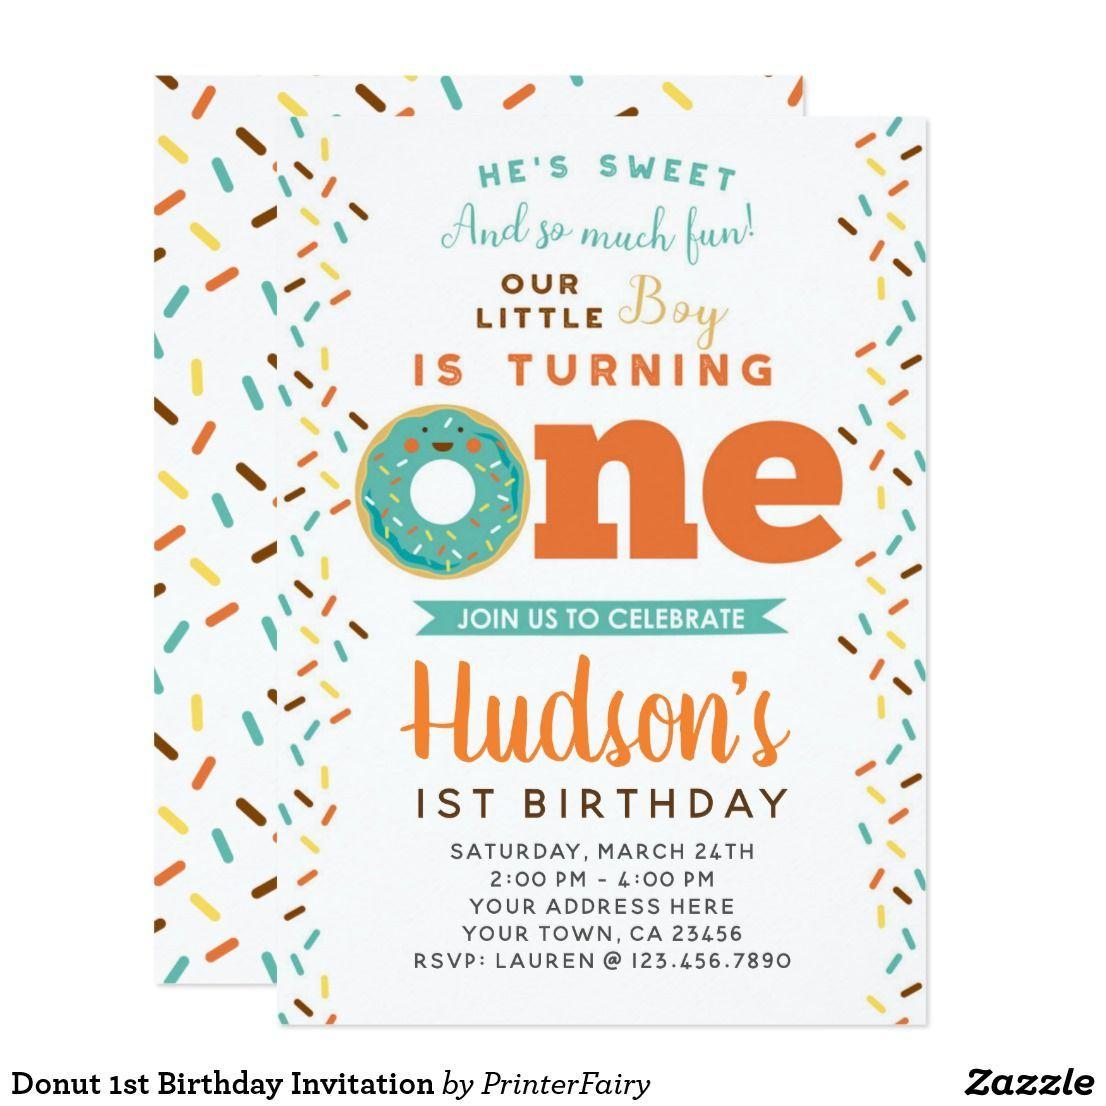 Image Result For 1st Birthday Donut Invitations 1st Birthday Invitations Birthday Invitations First Birthday Invitations